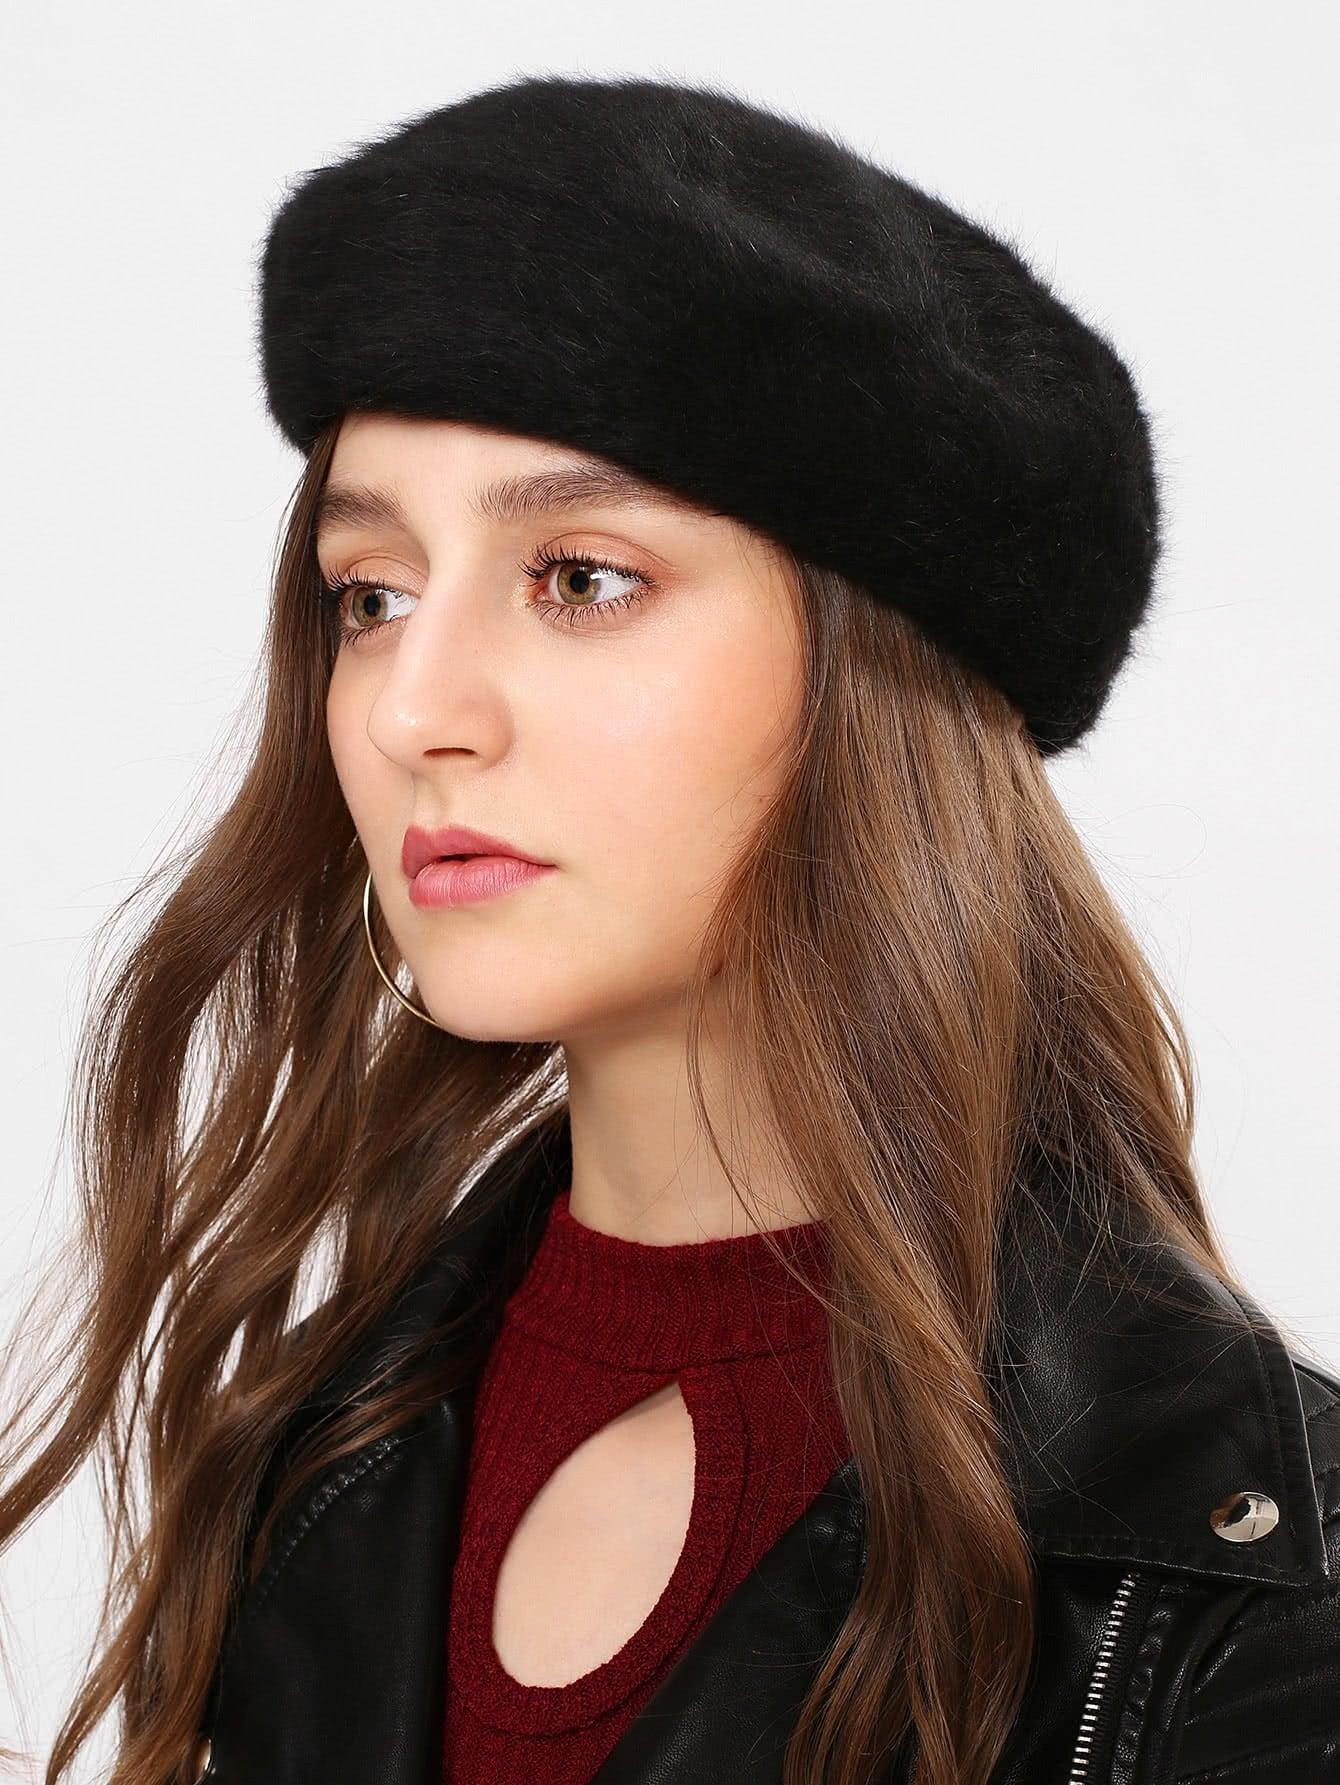 Faux Fur Beret Cap 2016 fashion hats for women genuine mink fur hat knitted winter fur hats ladies elegant mink beret cap trendy warm thick beanies